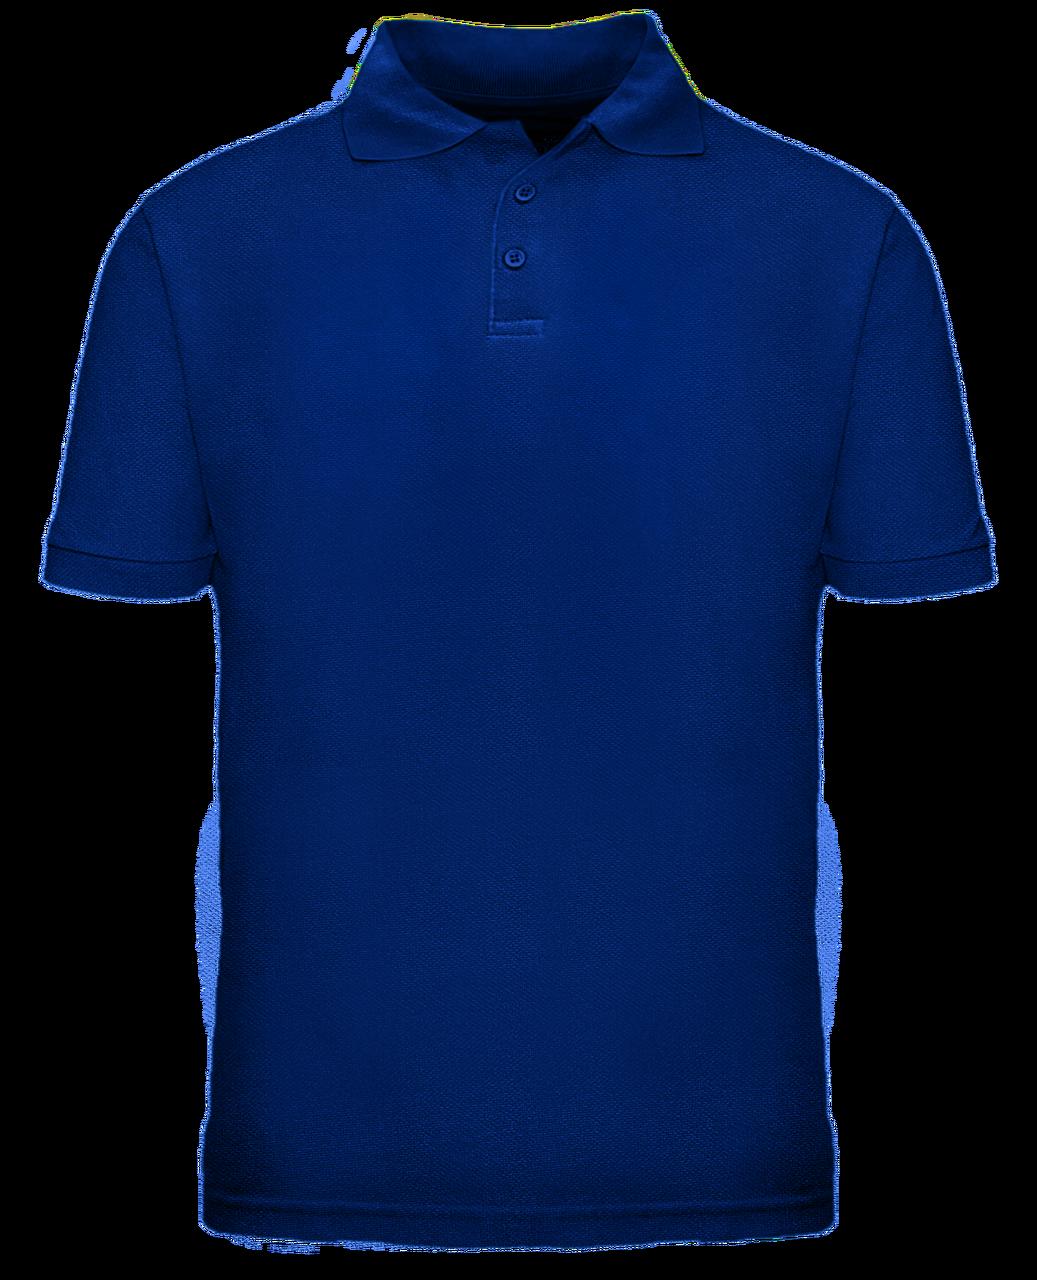 c5049627a ... Short Sleeve School Uniform Polo - Royal. Image 1. Click to enlarge